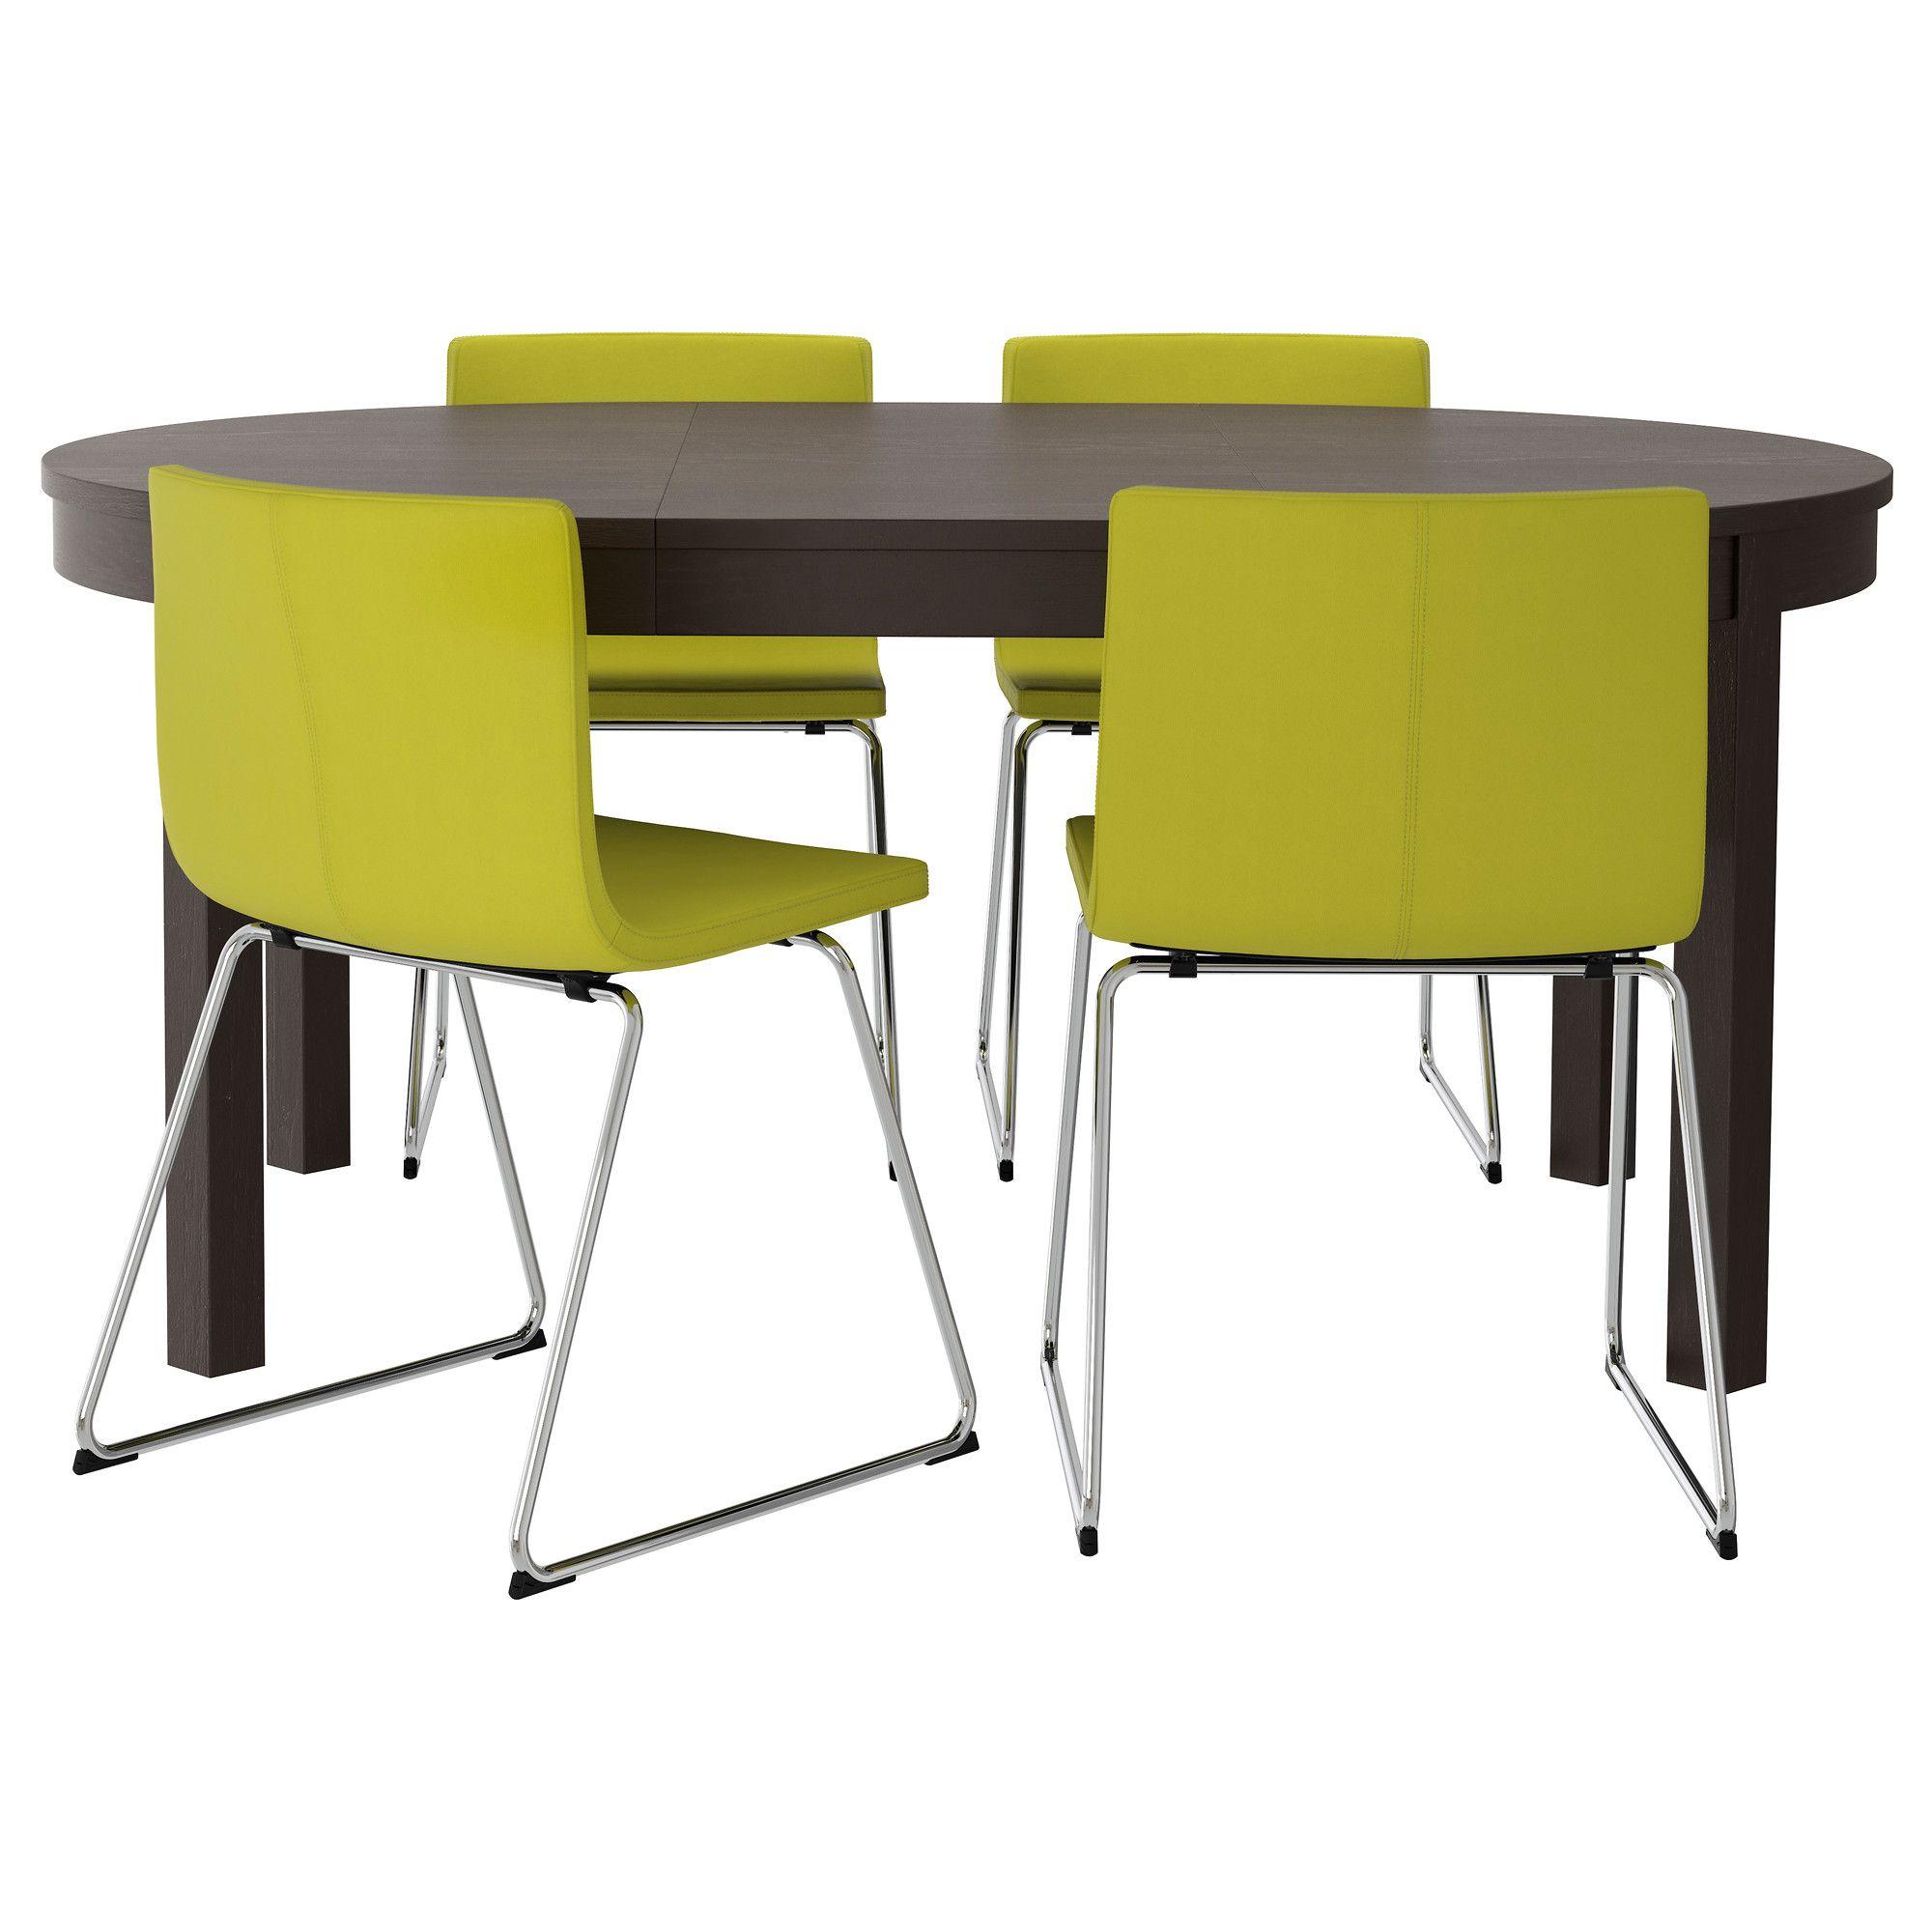 BJURSTA BERNHARD Table And 4 Chairs Brown Black Kavat Green Yellow